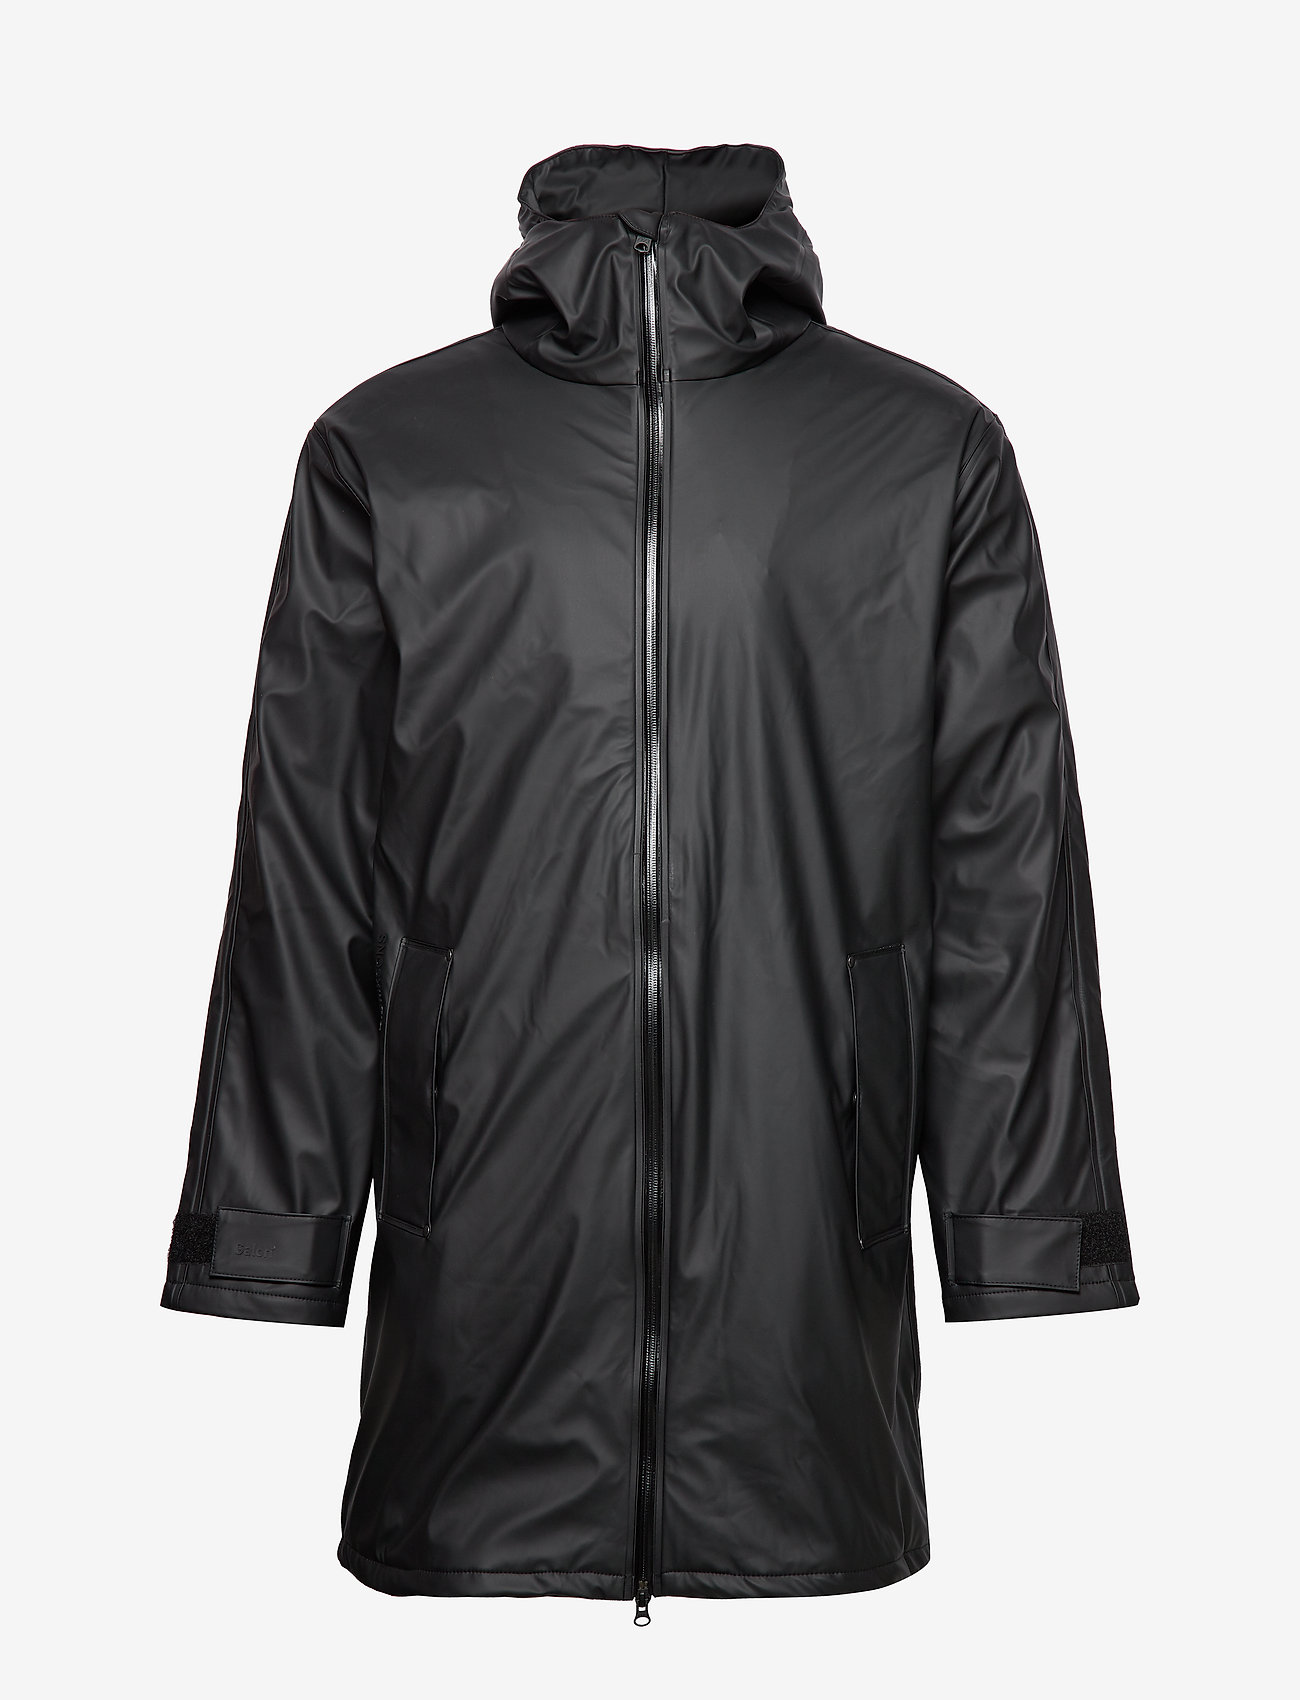 Didriksons - ICELAND USX PARKA 2 - rainwear - black - 1